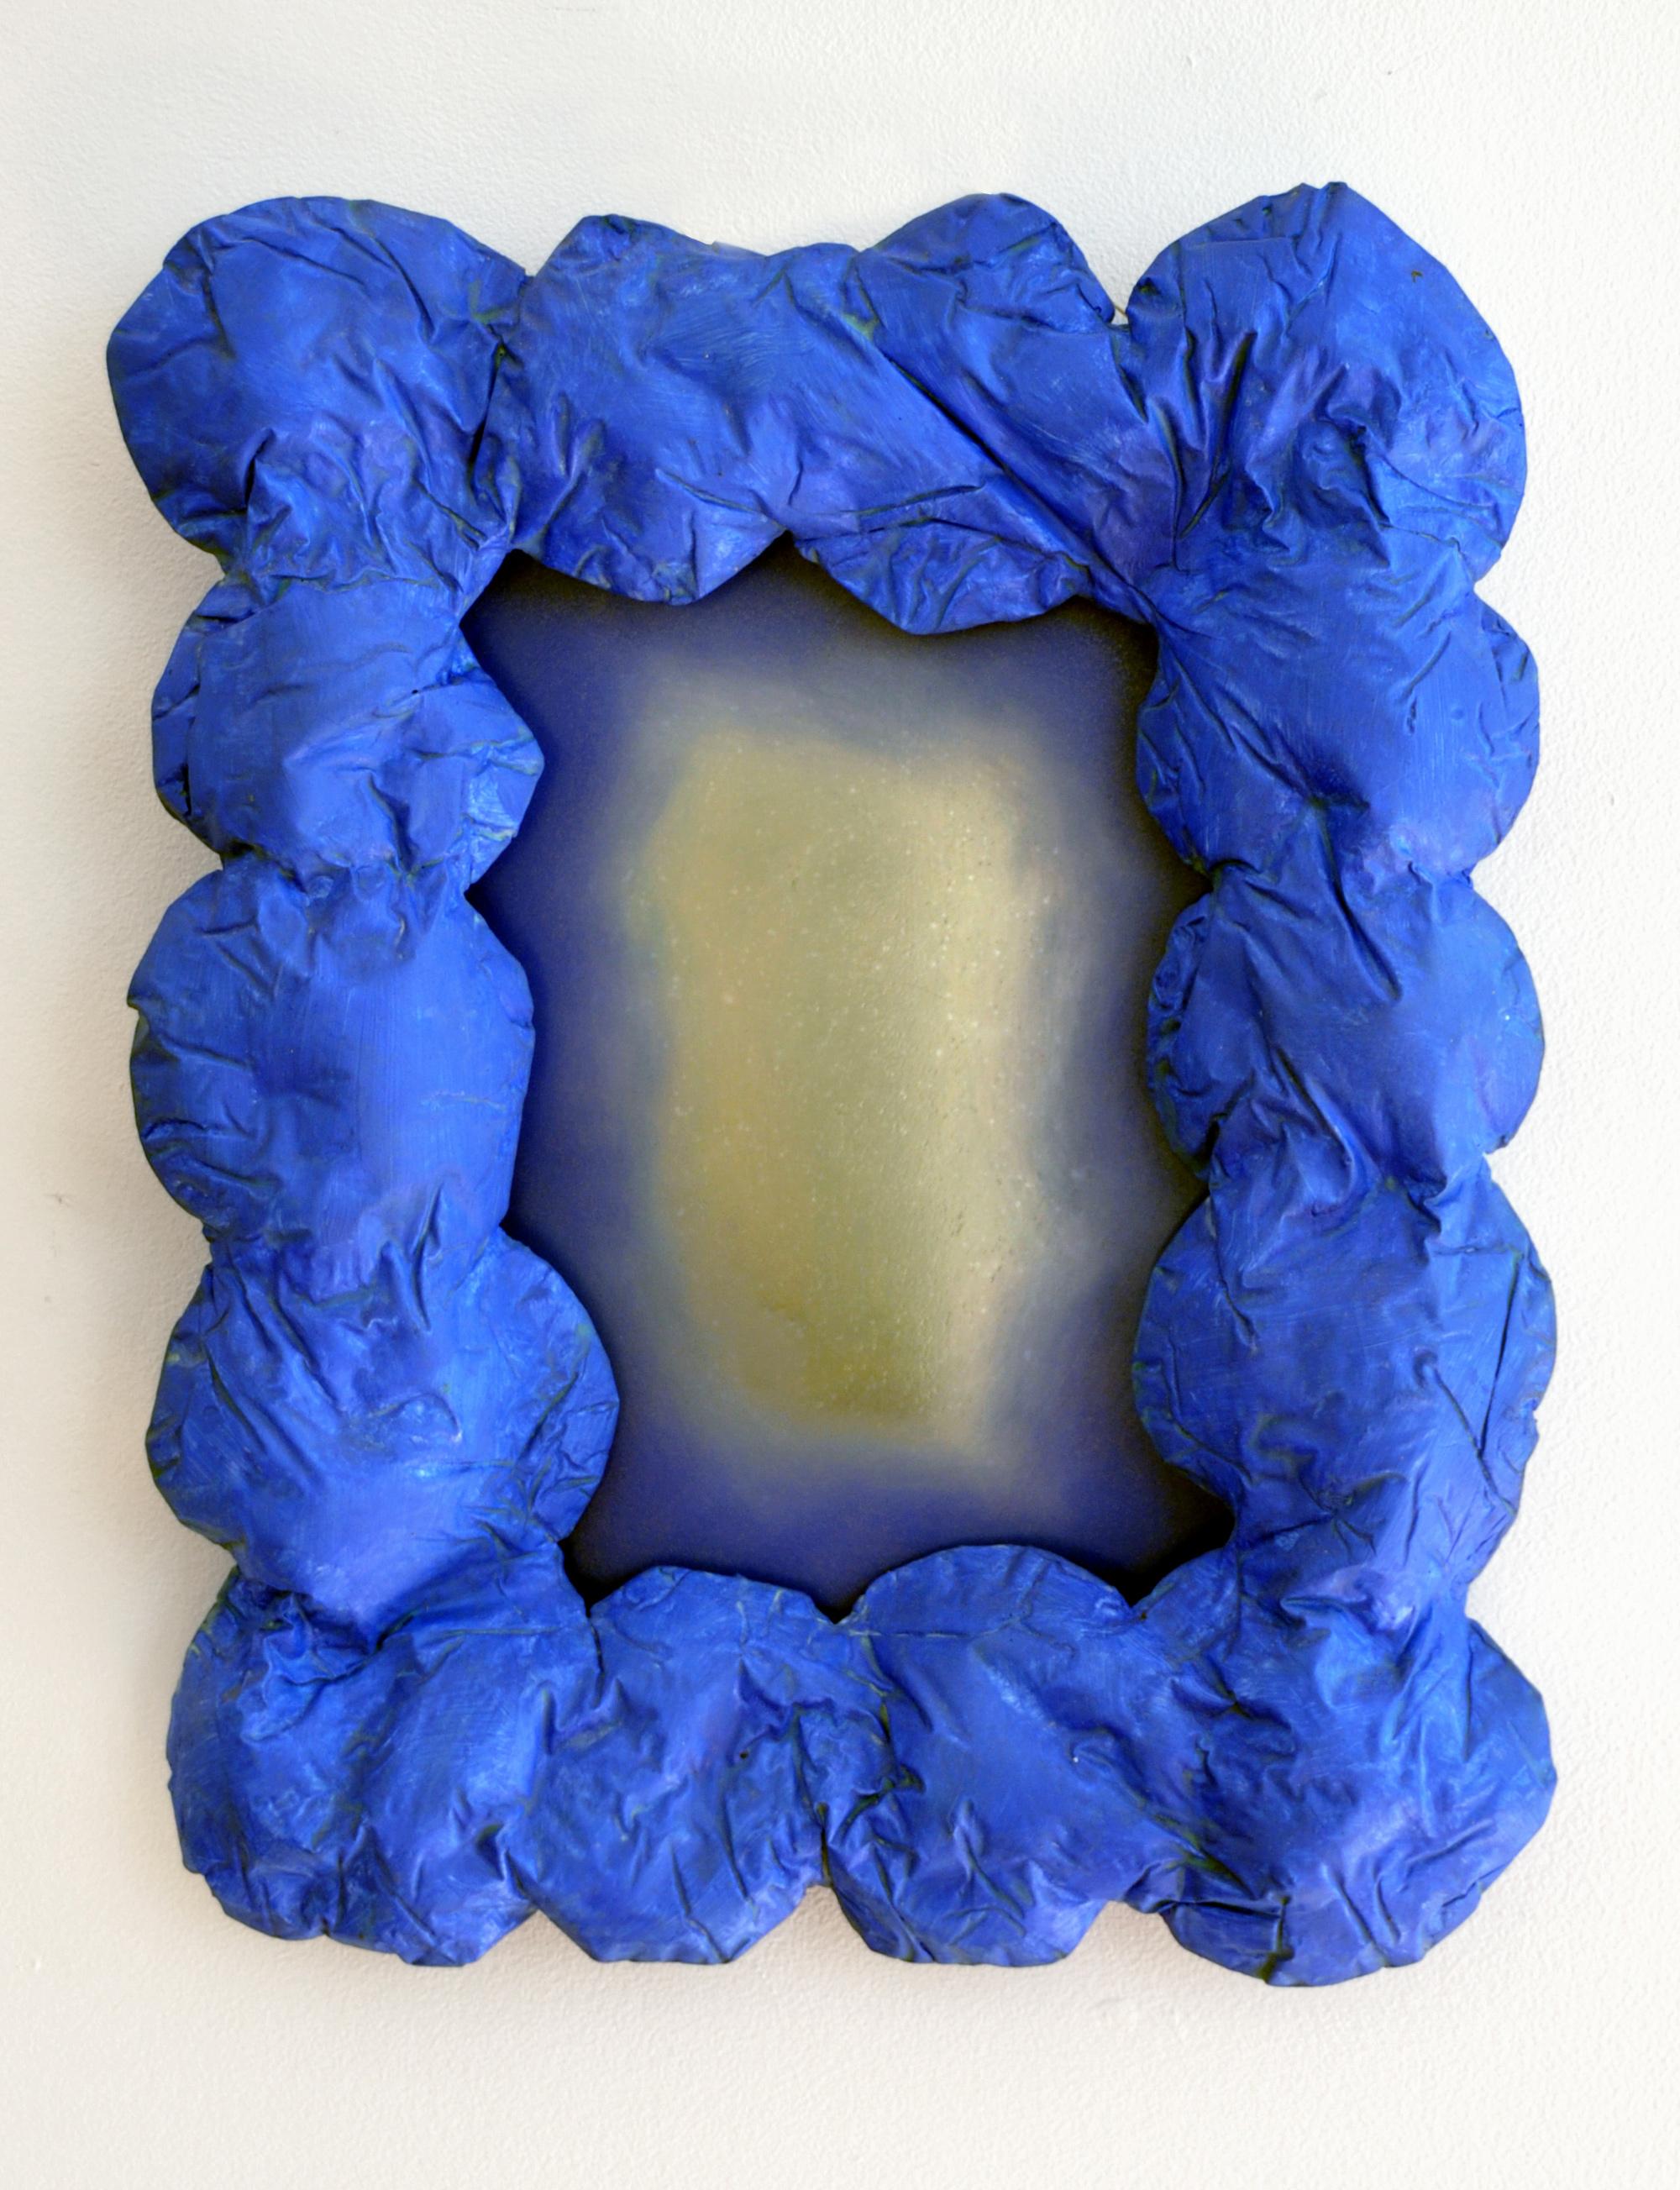 BELEM LETT  Blue  2015 oil on perspex panel, luminescent pigment, polyester resin 43 × 33 × 6 cm